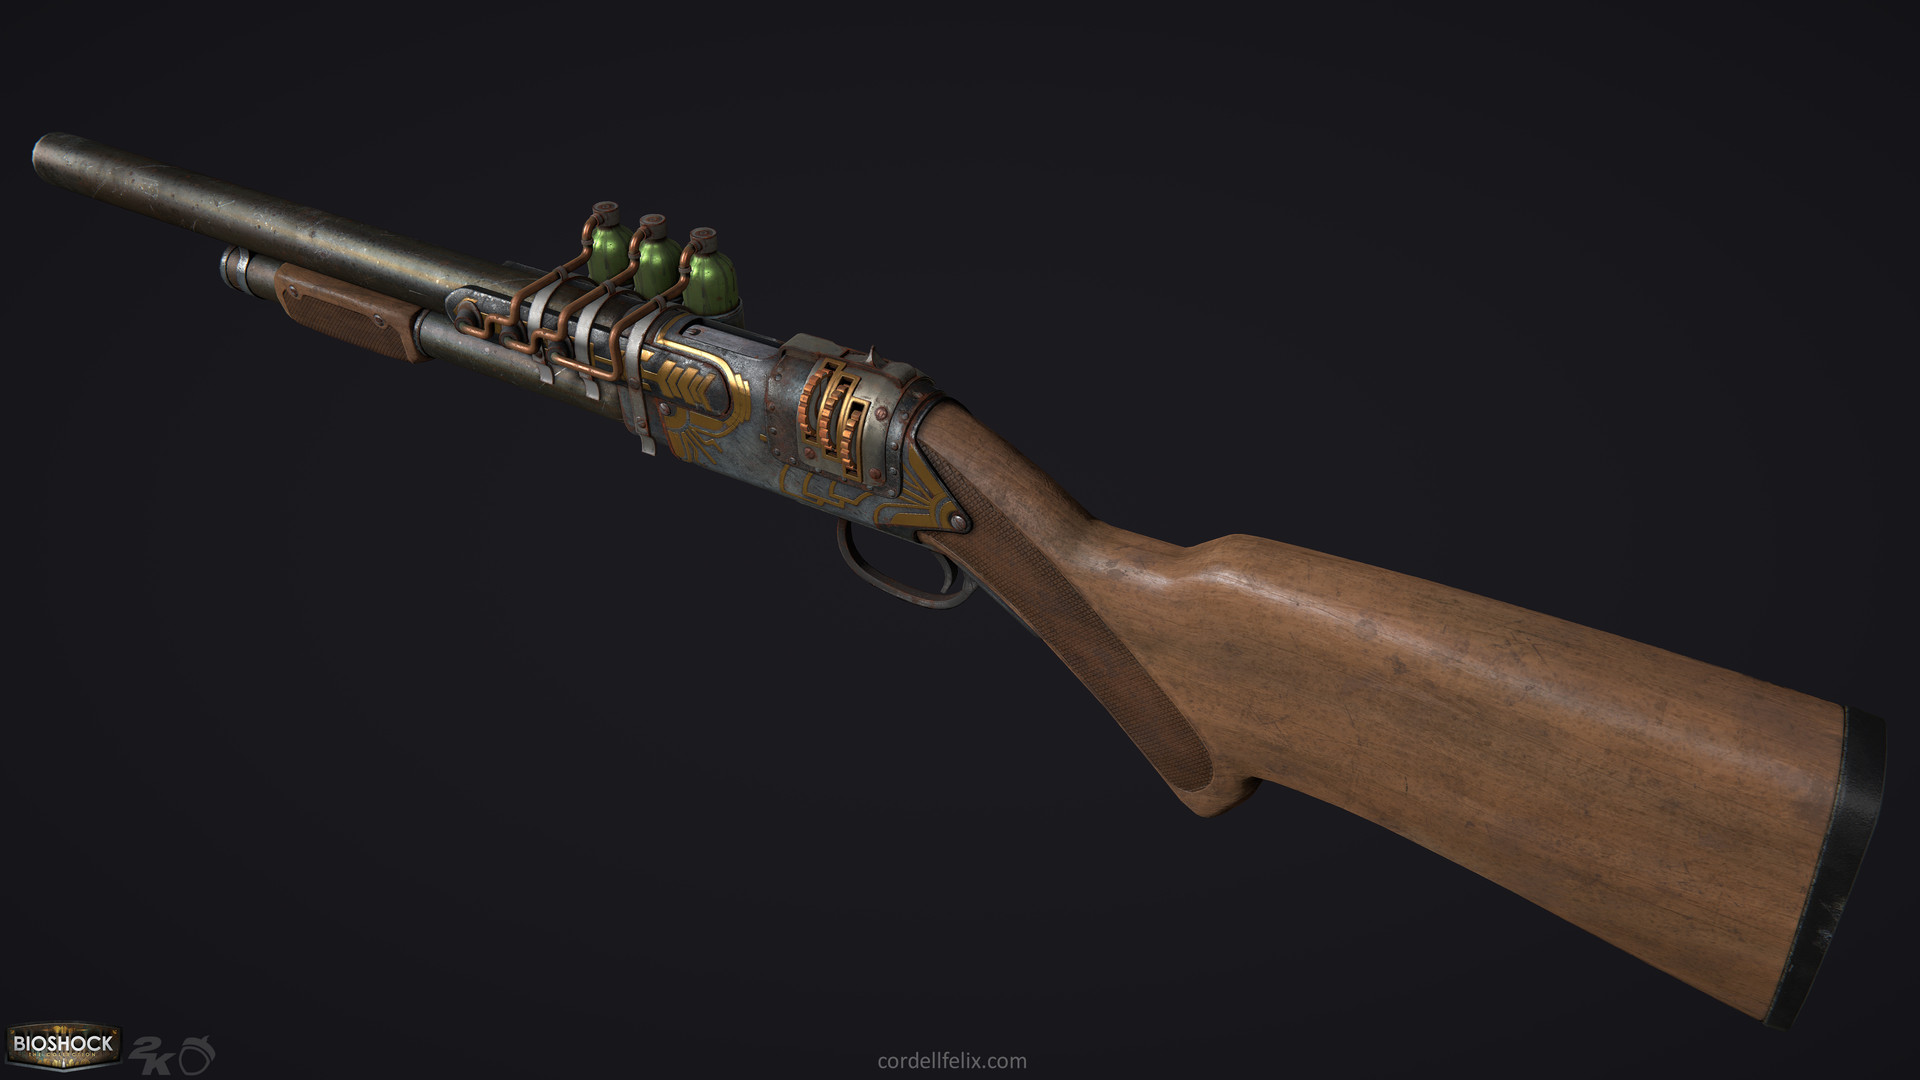 Cordell felix cordellfelix shotgun 10